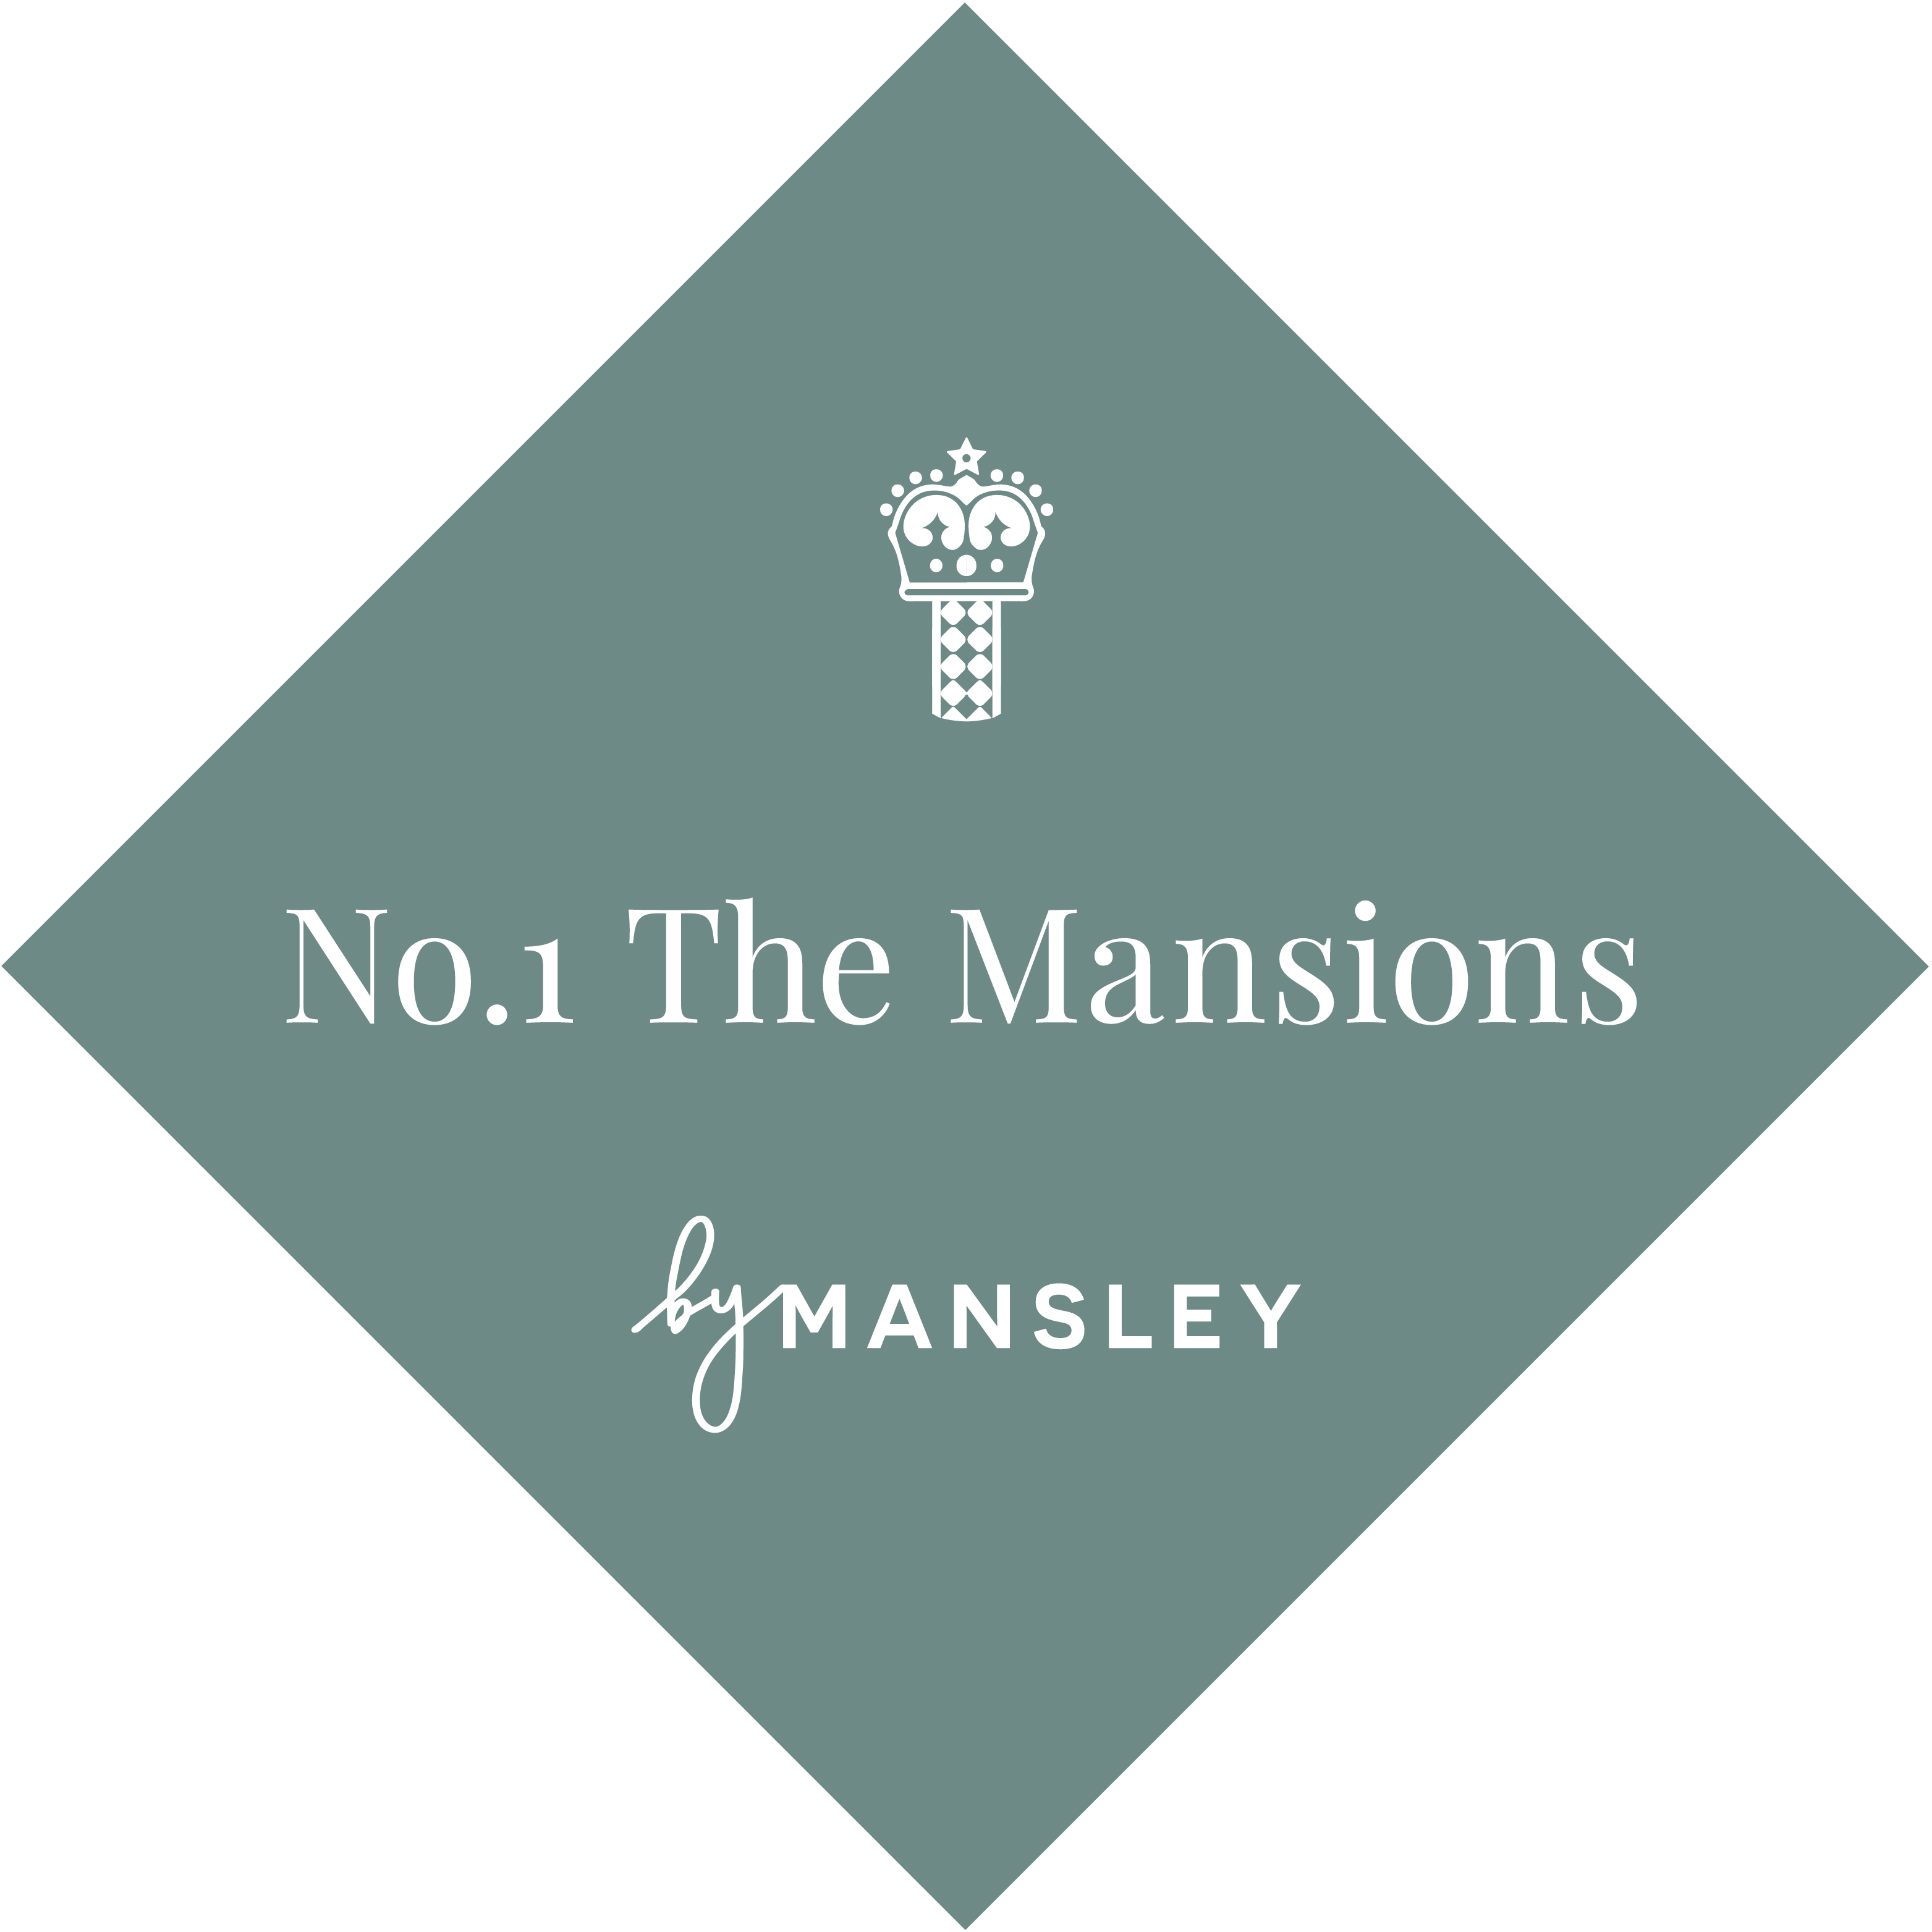 no.1 the mansions diamond icon